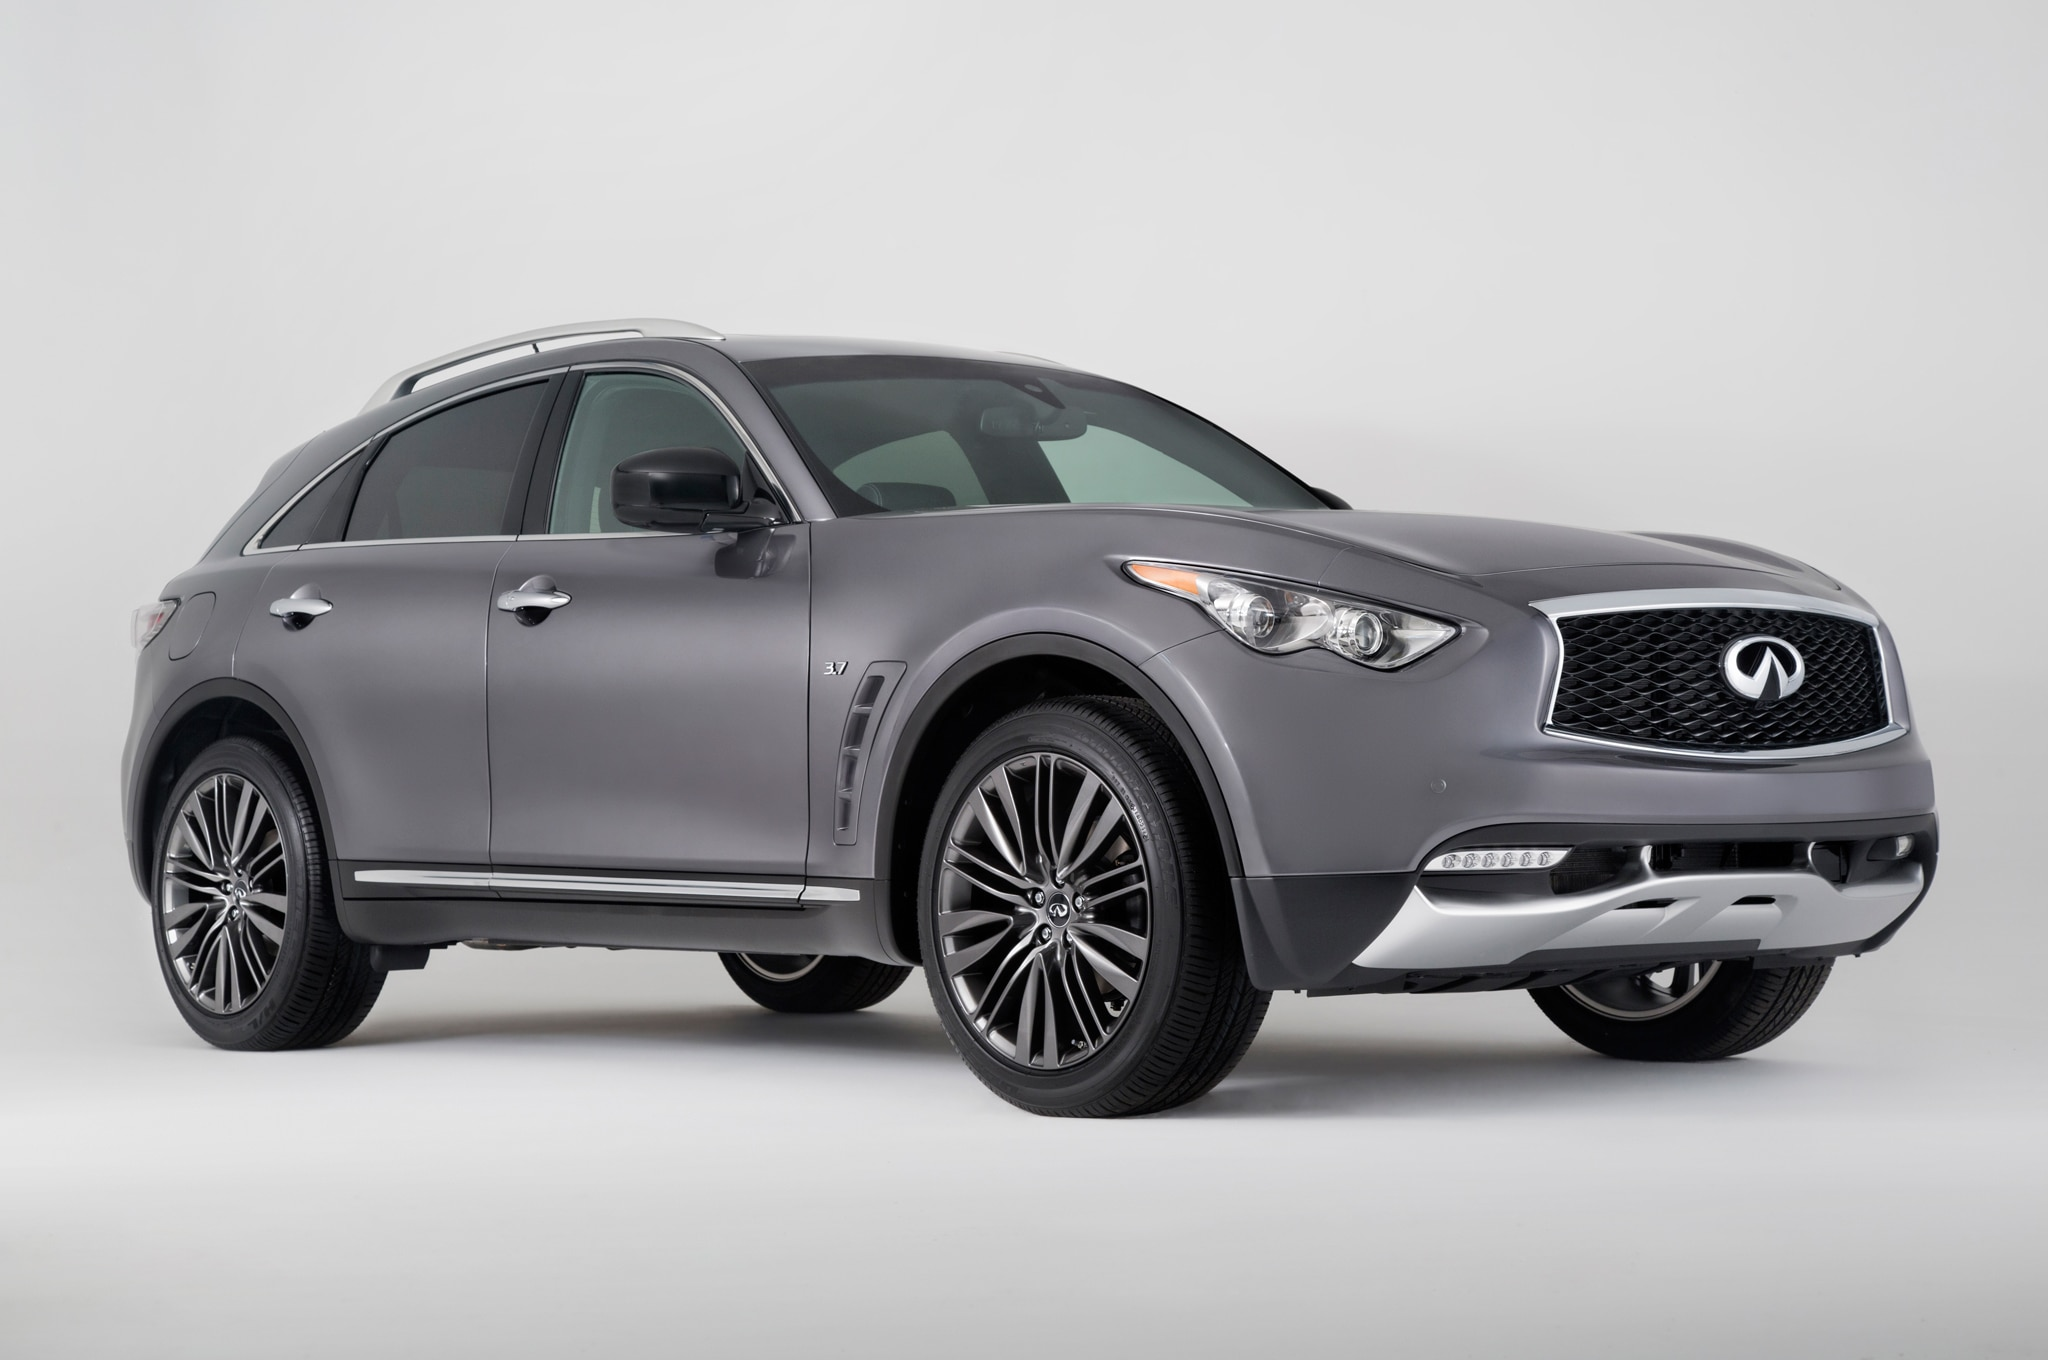 Infiniti Qx70 Discontinued For 2018 Automobile Magazine